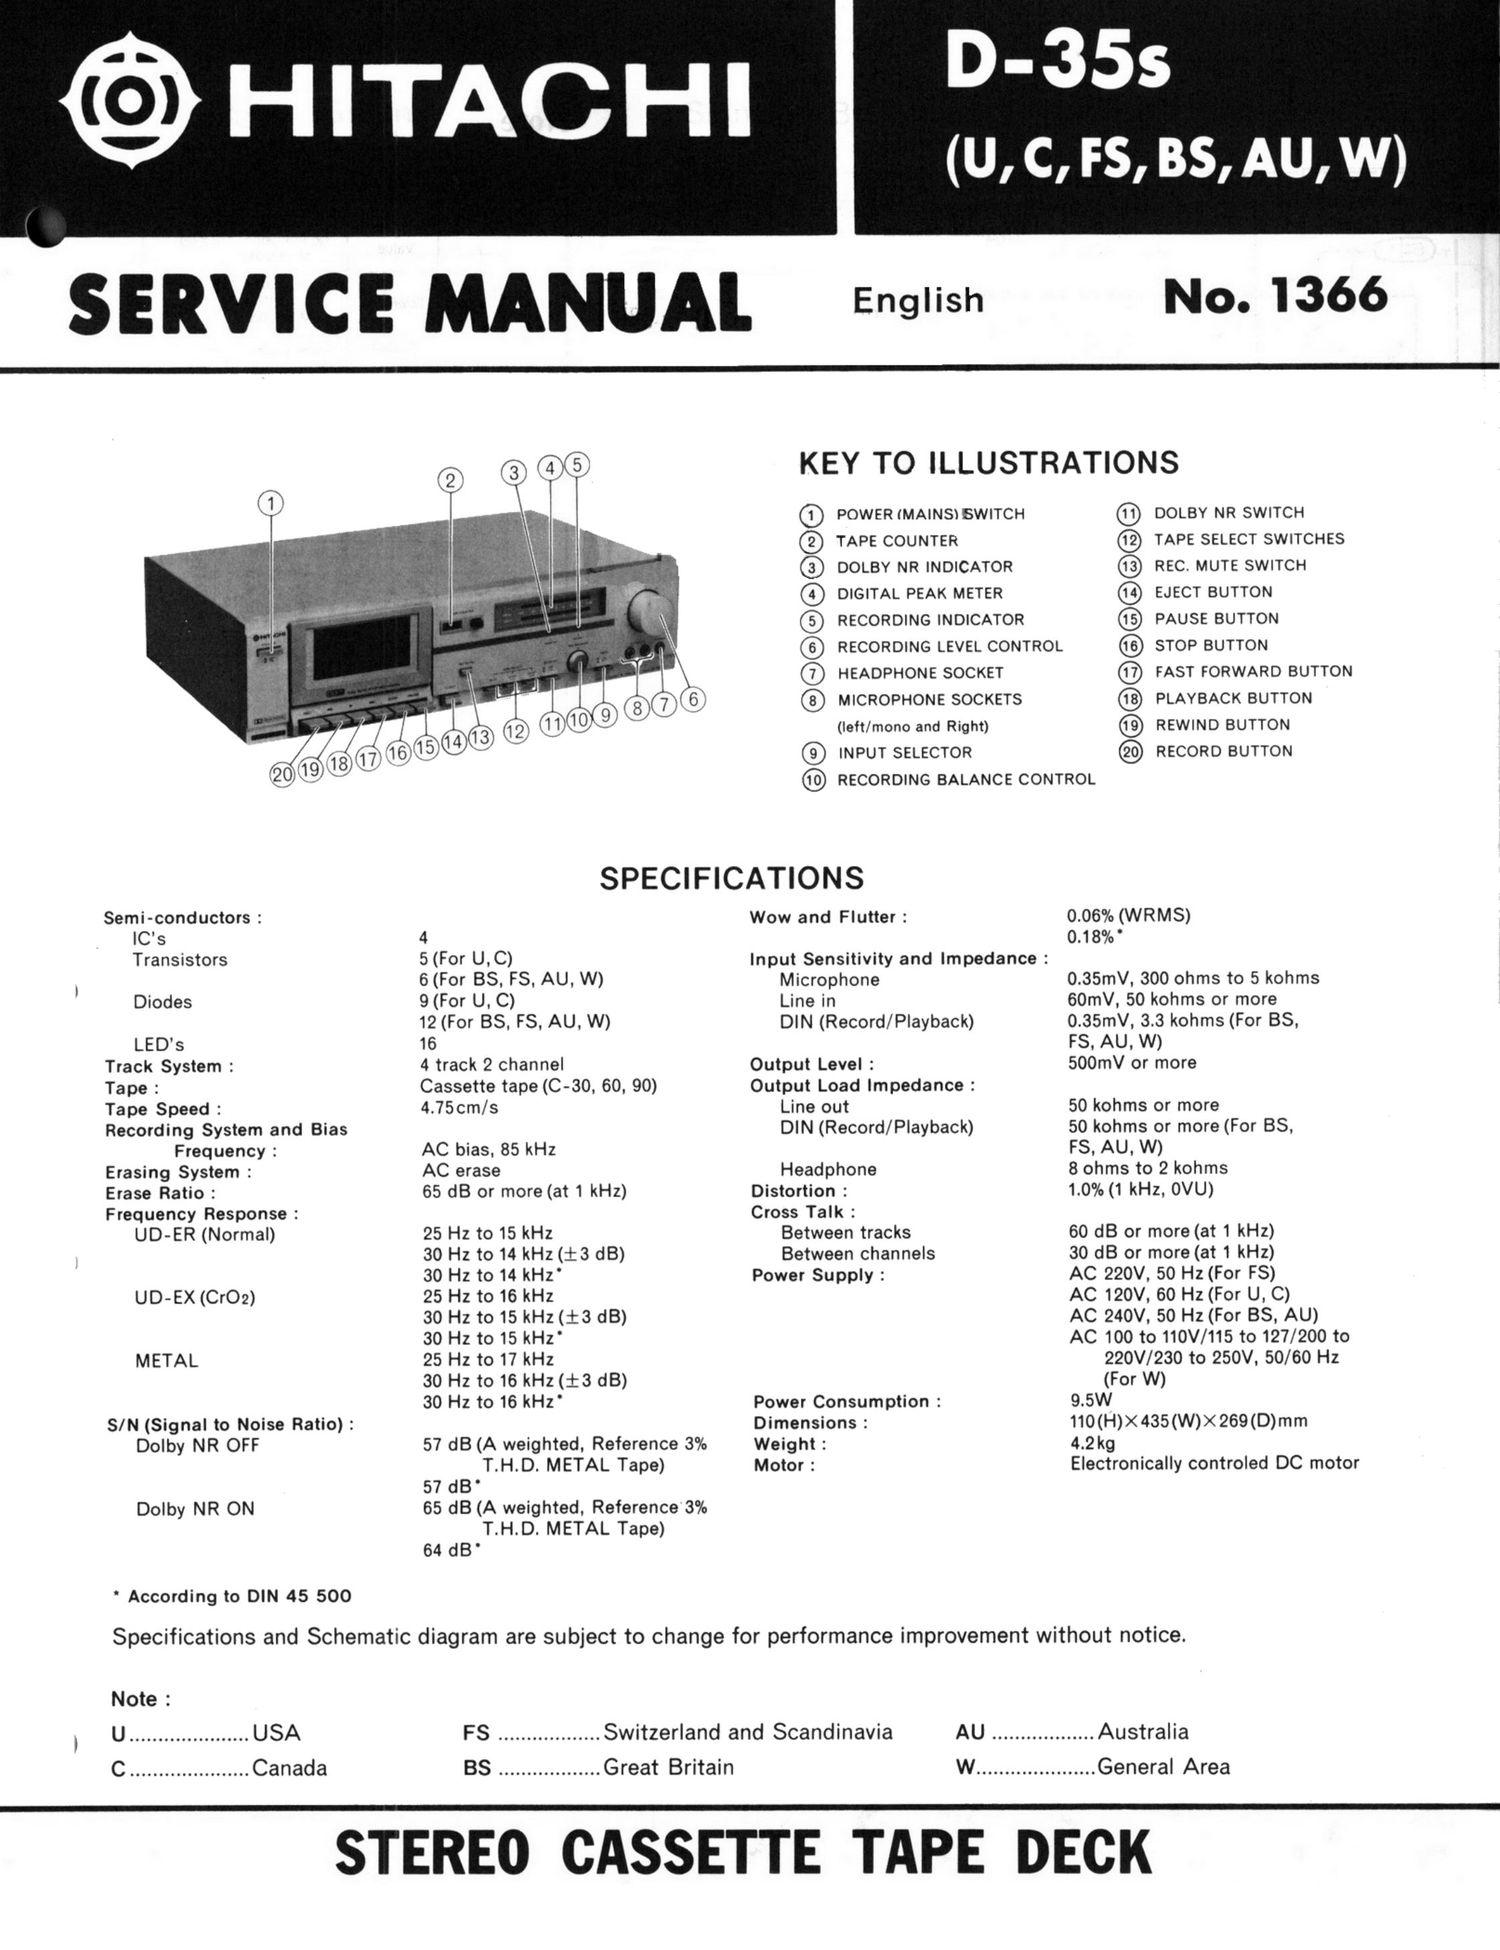 Hitachi D-35s Stereo Cassette Tape Deck Service Manual Vintage HiFi 80/'s